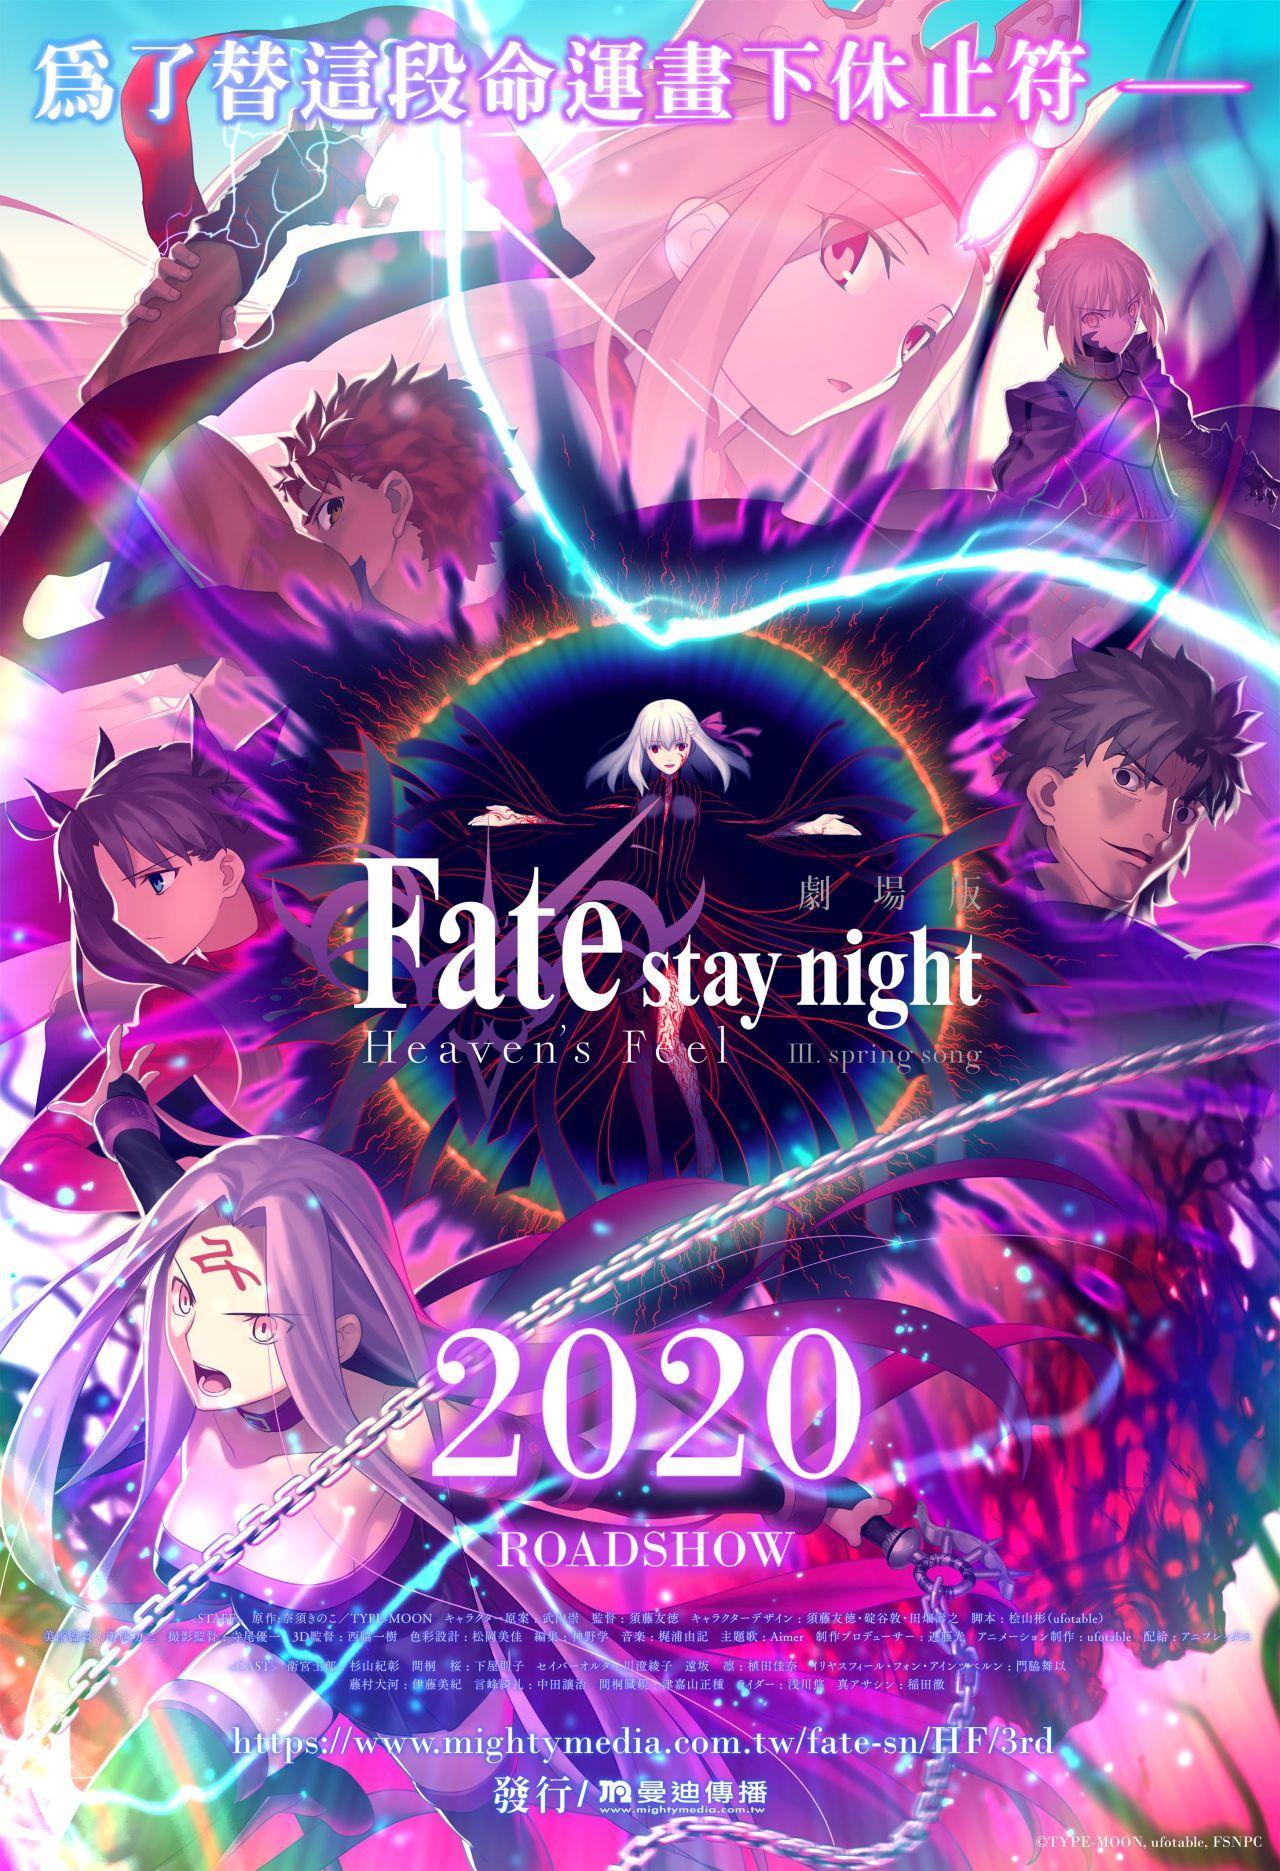 Fate/stay night [Heaven's Feel] III.春櫻之歌 時刻表、Fate/stay night [Heaven's Feel] III.春櫻之歌 預告片